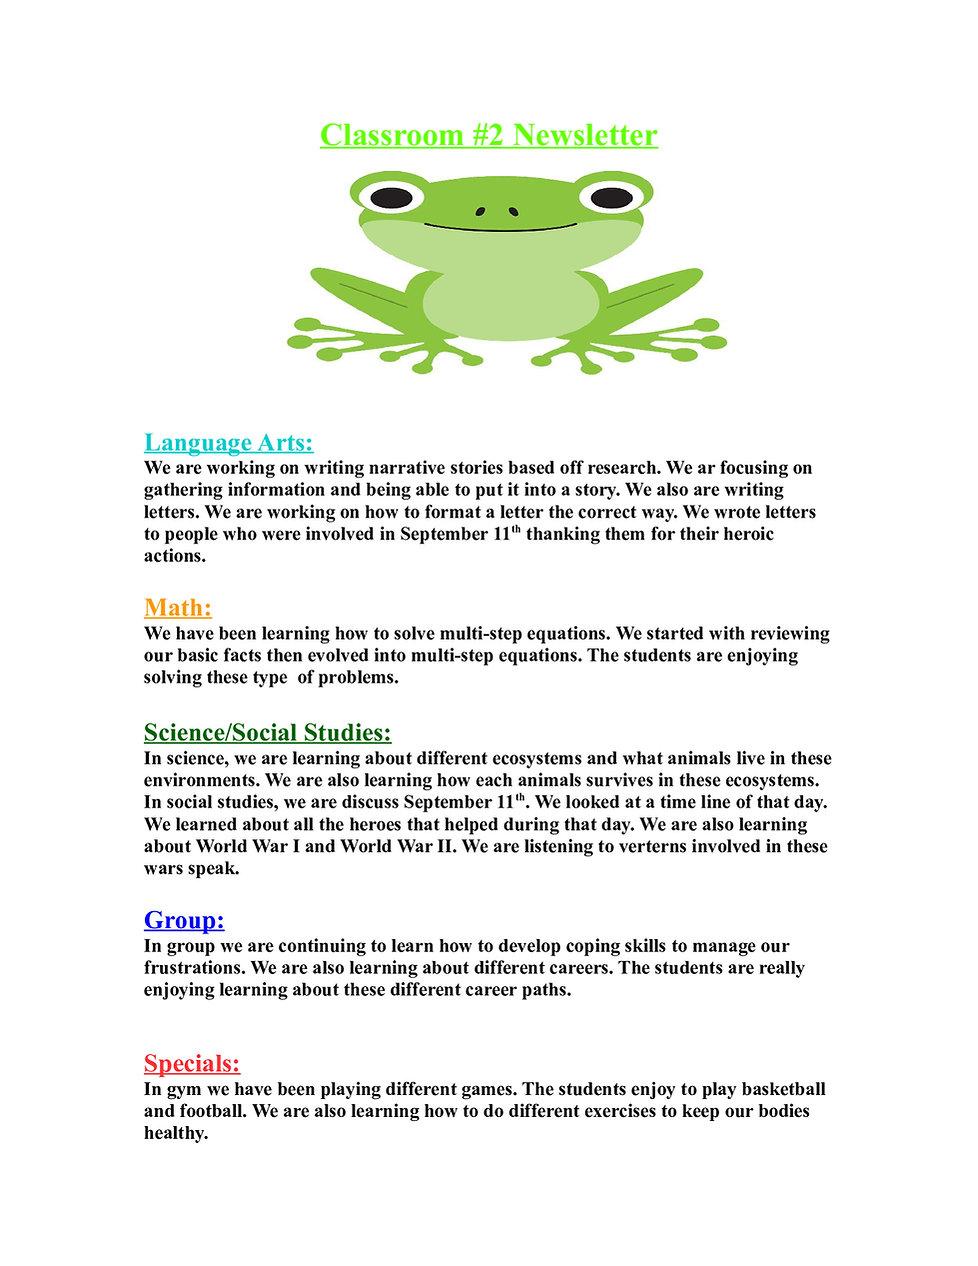 Classroom-_2-Newsletter-_2_.jpg